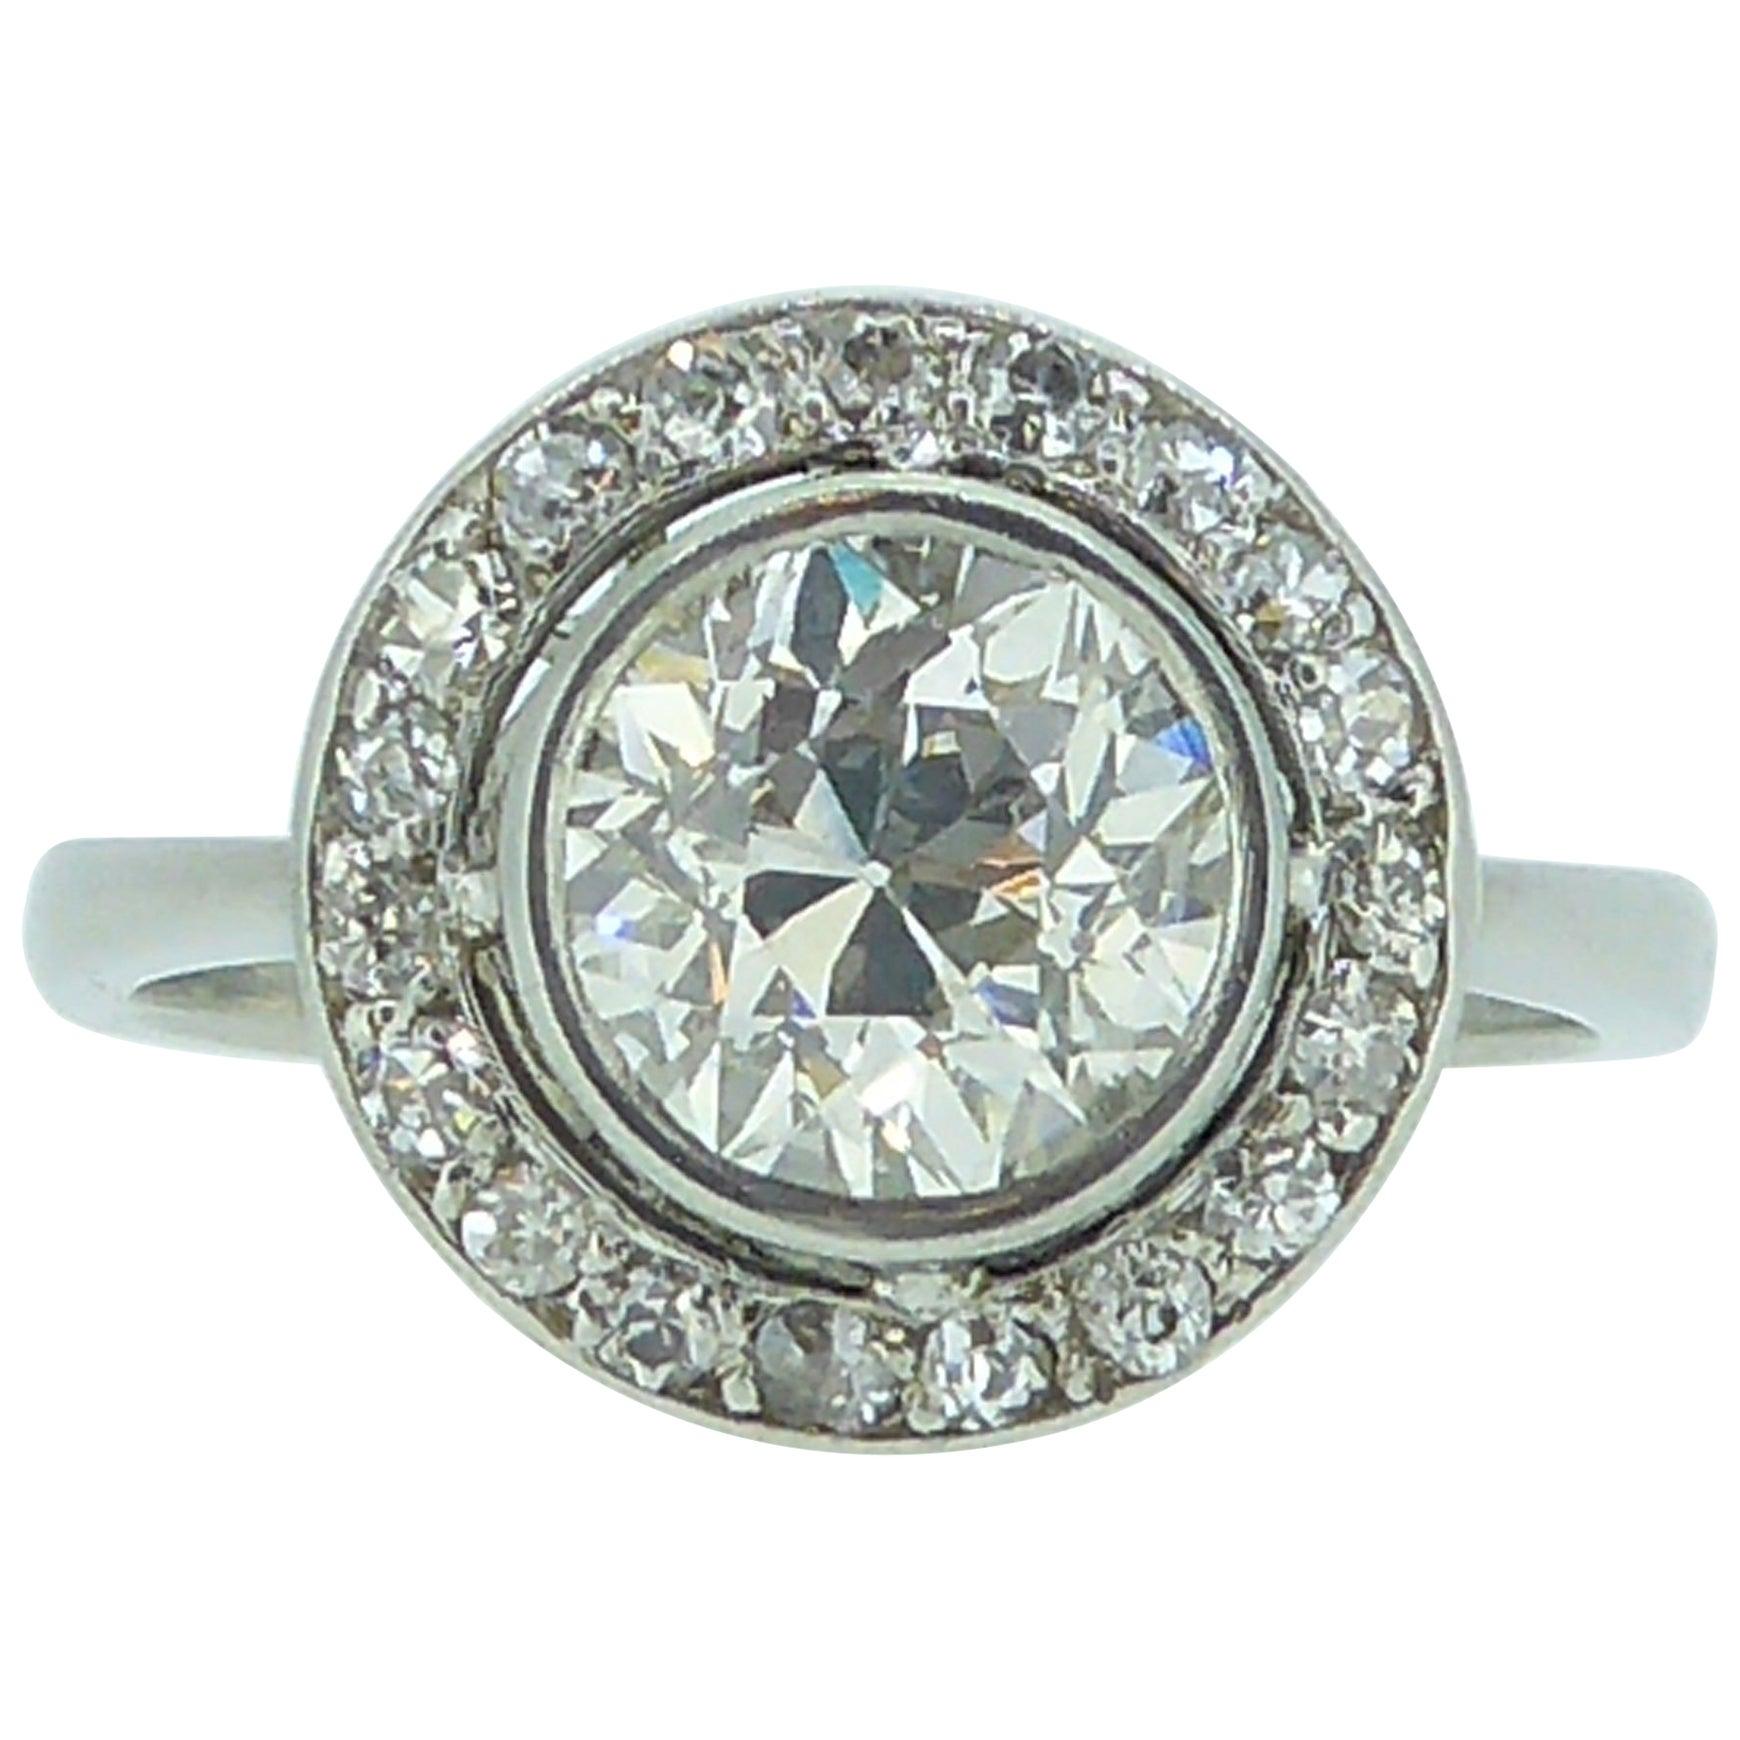 Art Deco 1.54 Carat Old European Halo Diamond Cut Engagement Ring